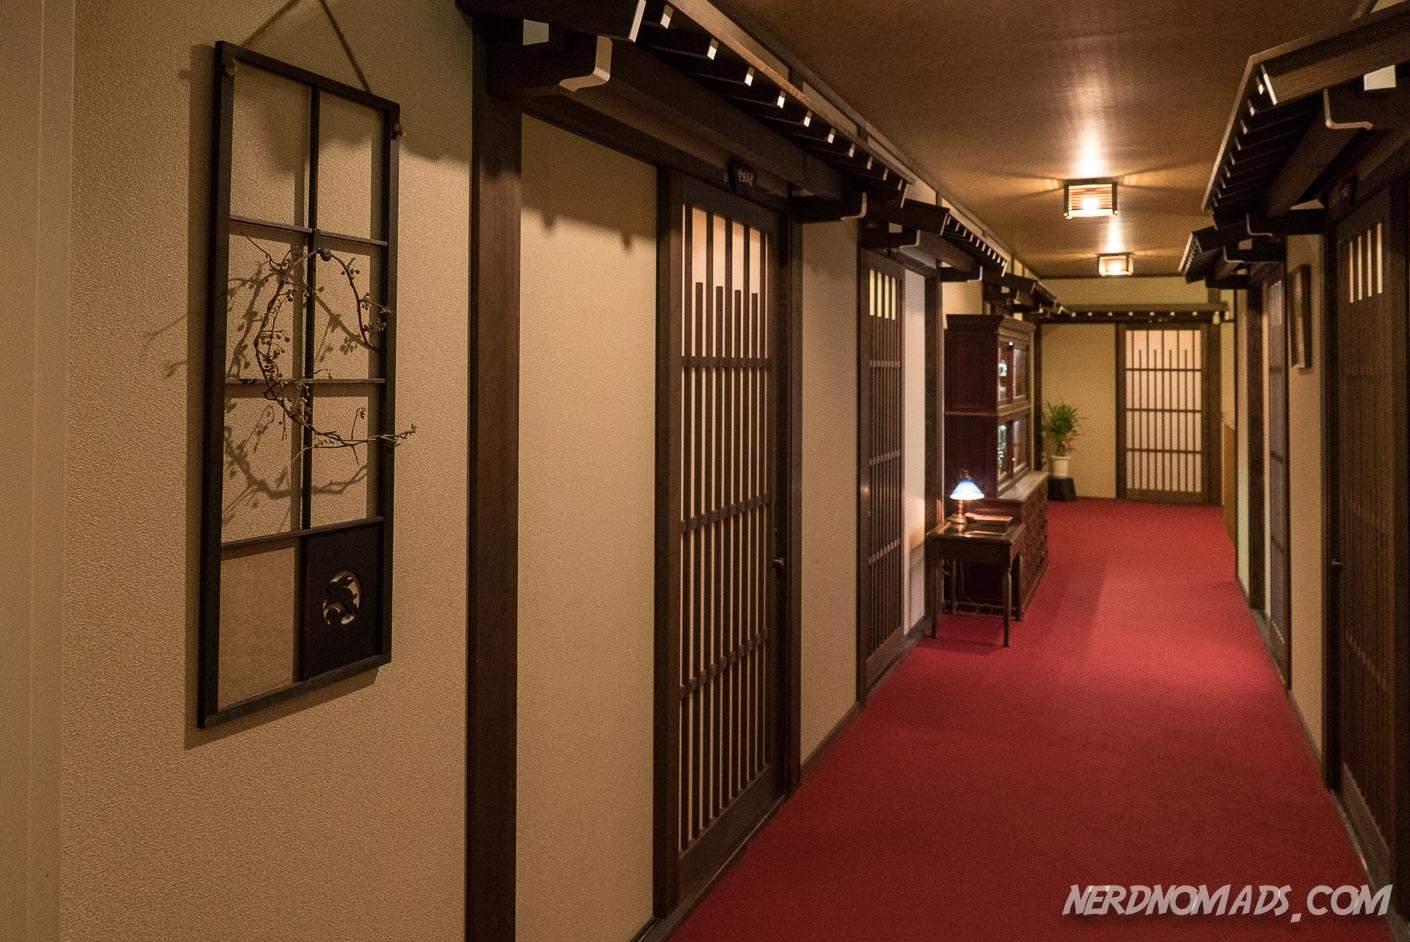 Living Like A Samurai In A Ryokan Nerd Nomads